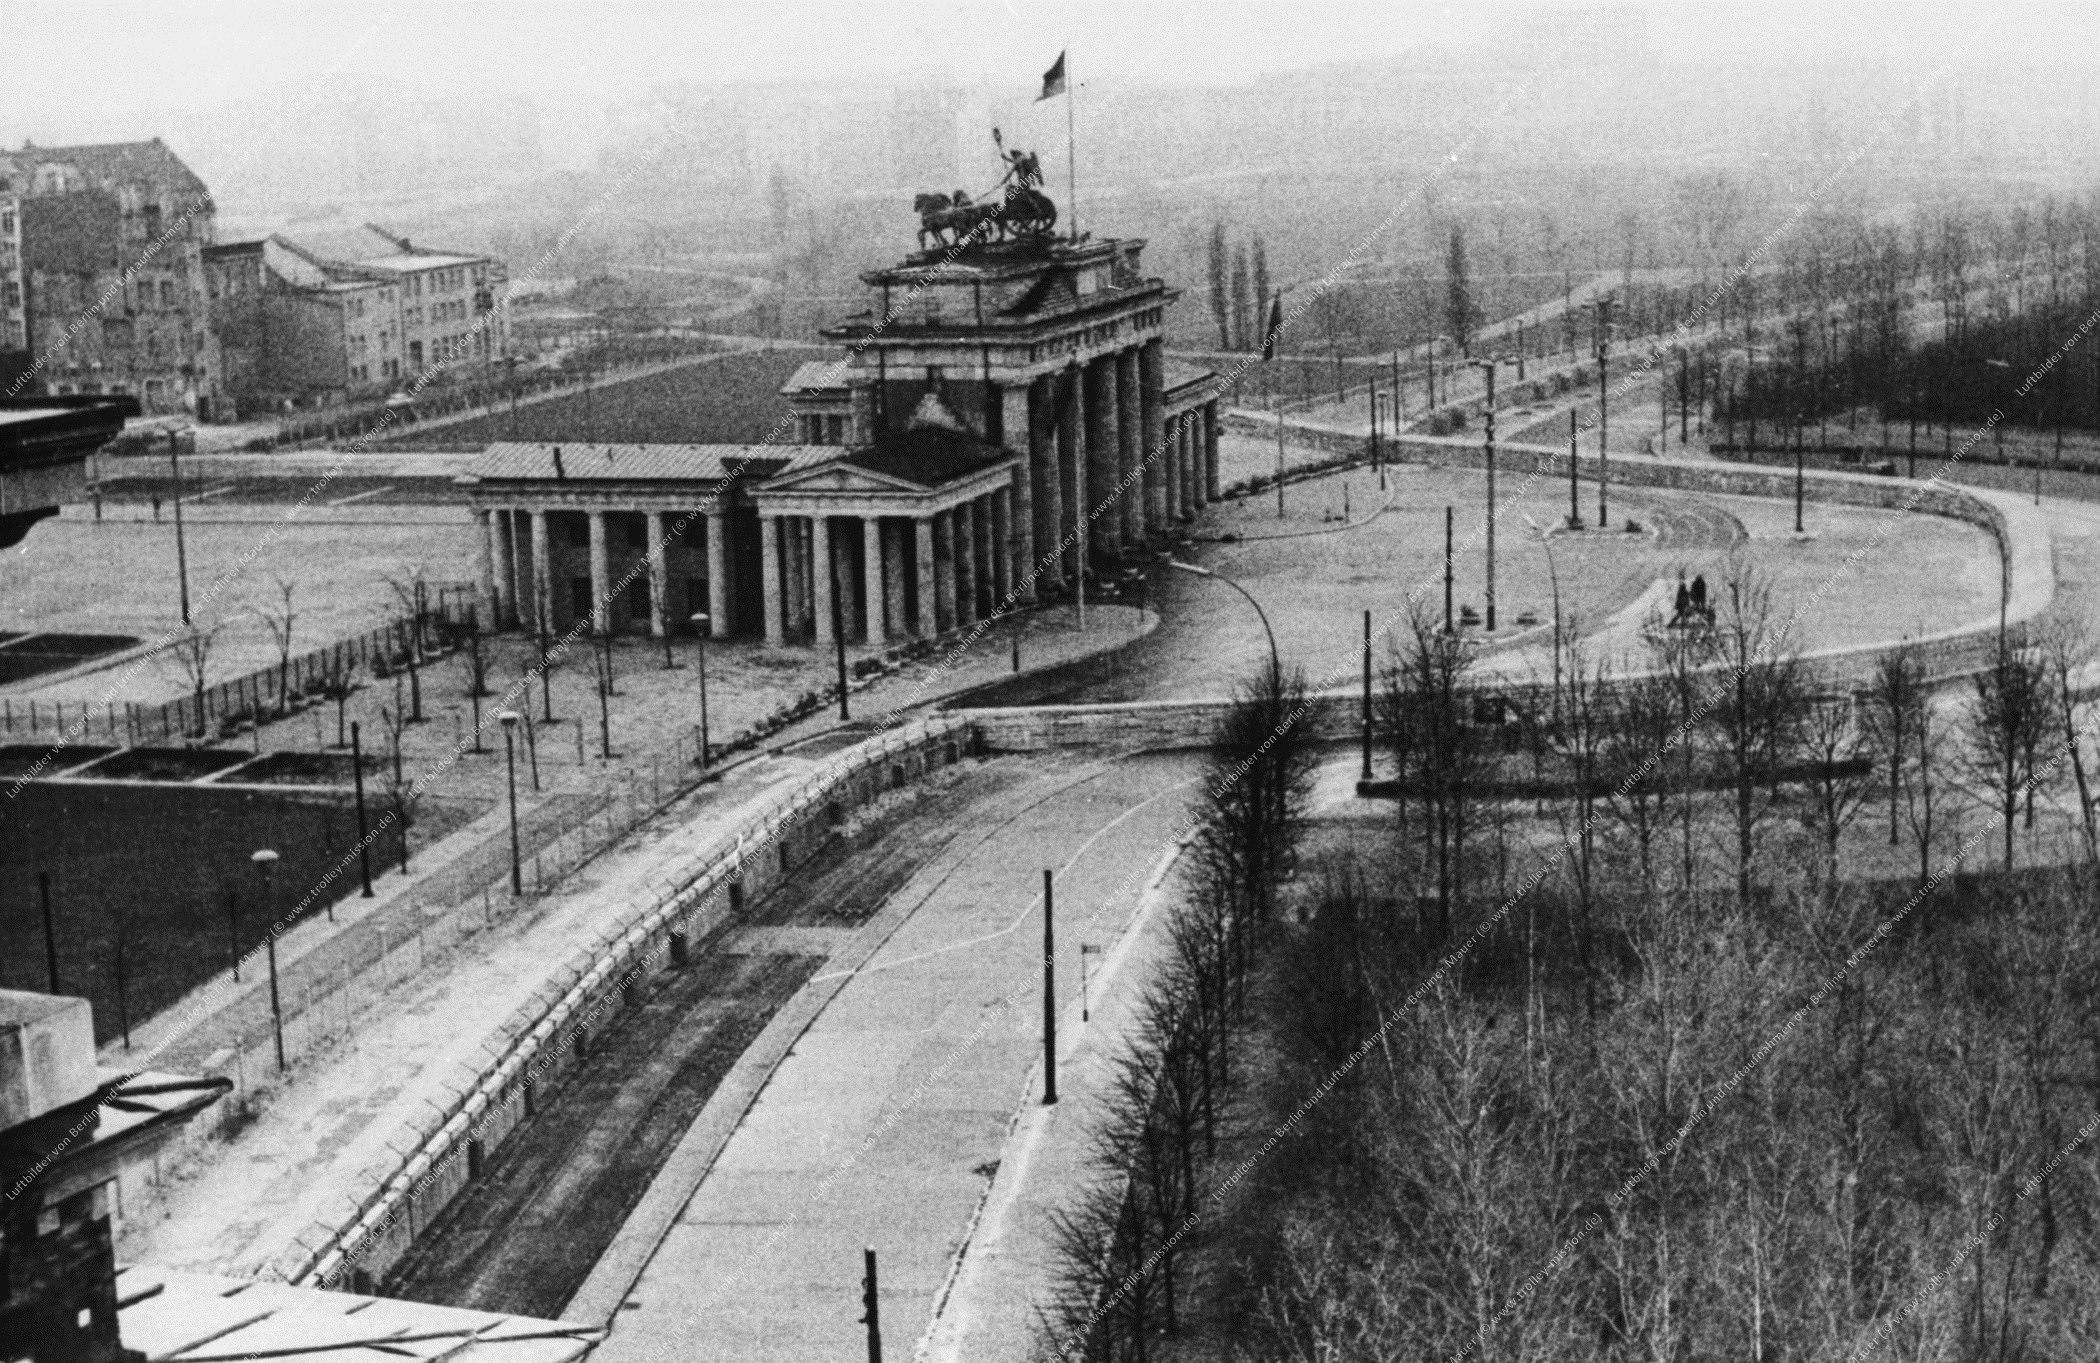 Berlin Luftbild Brandenburger Tor (Bild 009)